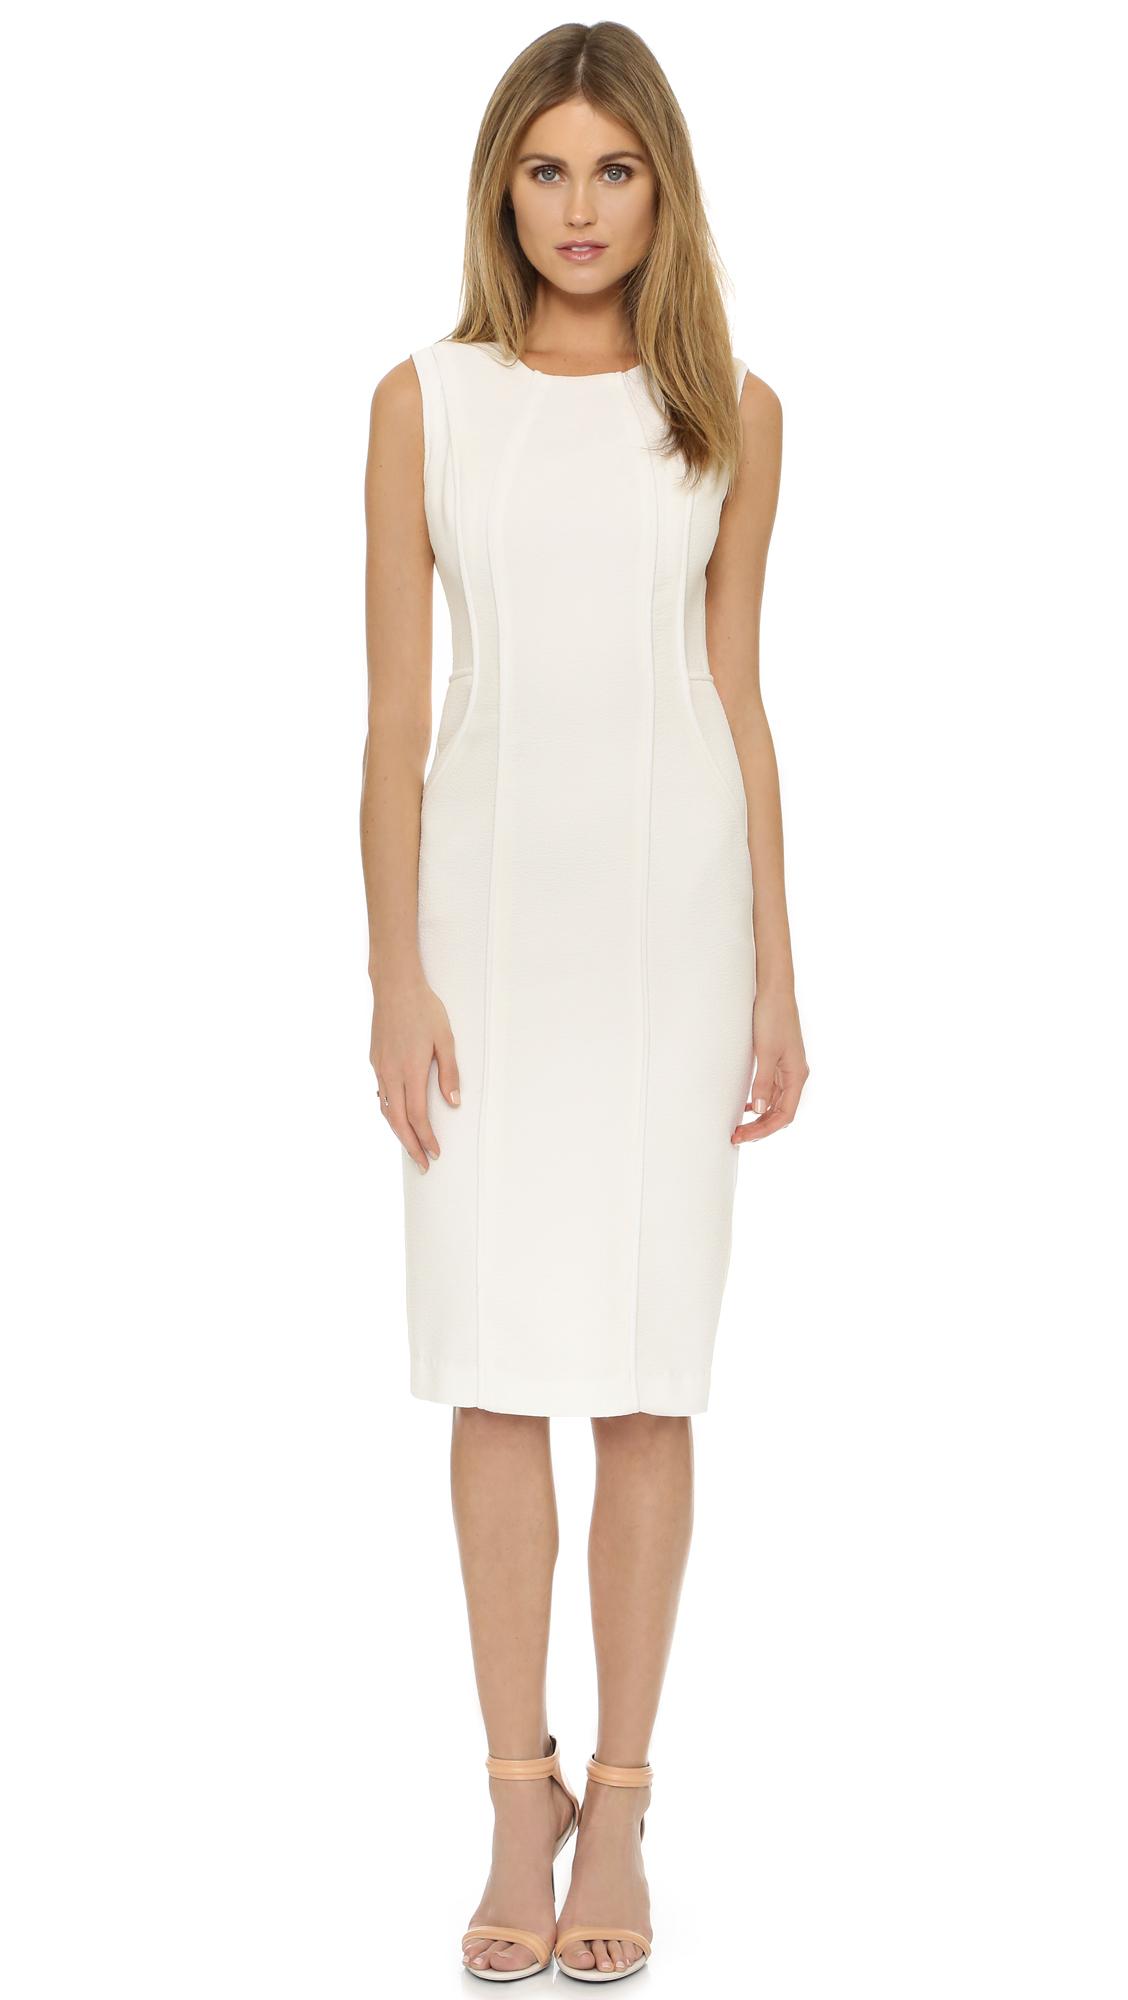 coctail dresses Palmdale